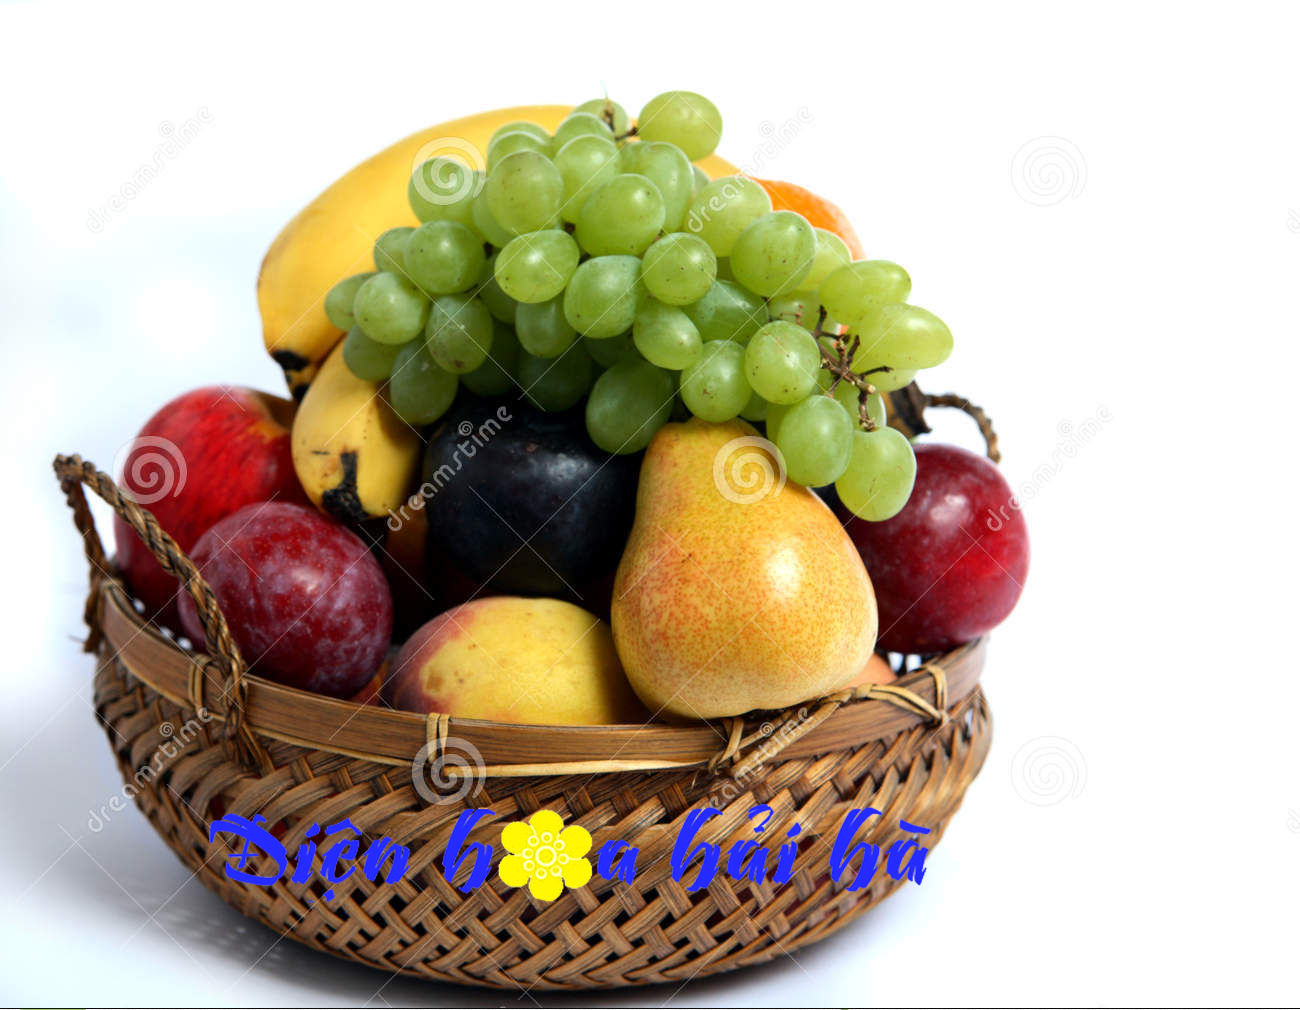 Mẫu giỏ hoa quả 14